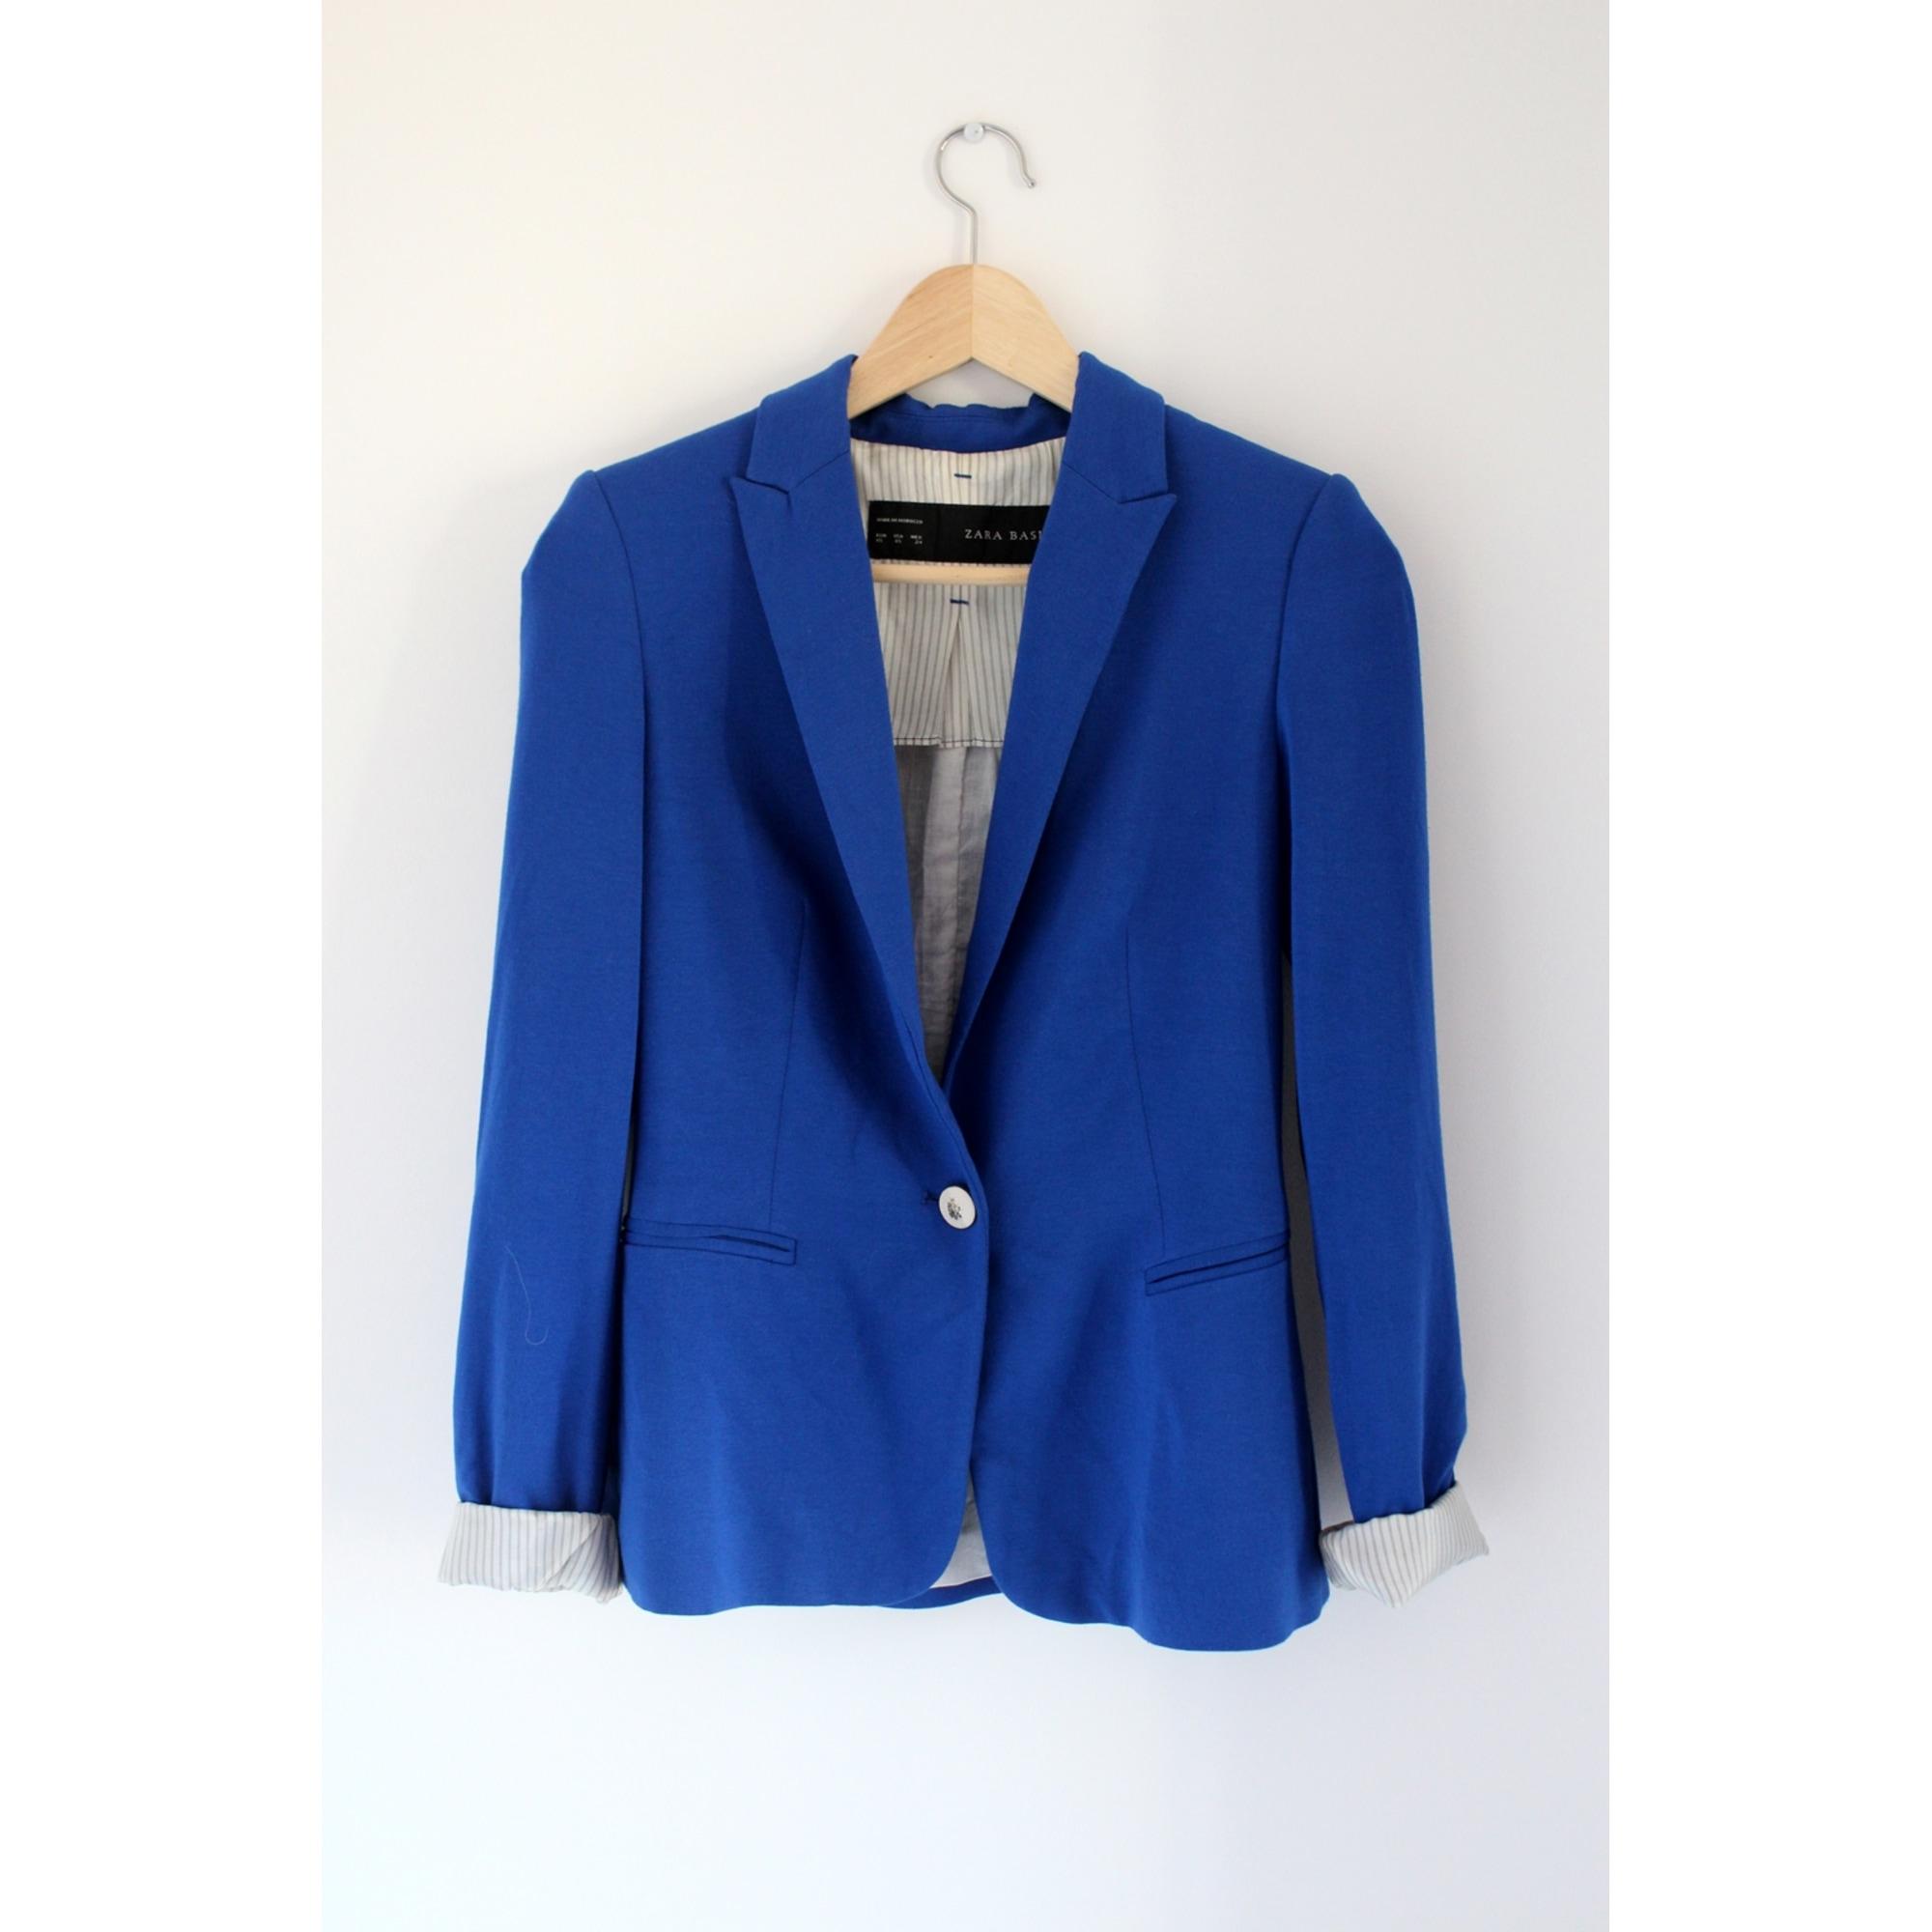 Blazer, veste tailleur THE KOOPLES 34 (XS, T0) bleu vendu